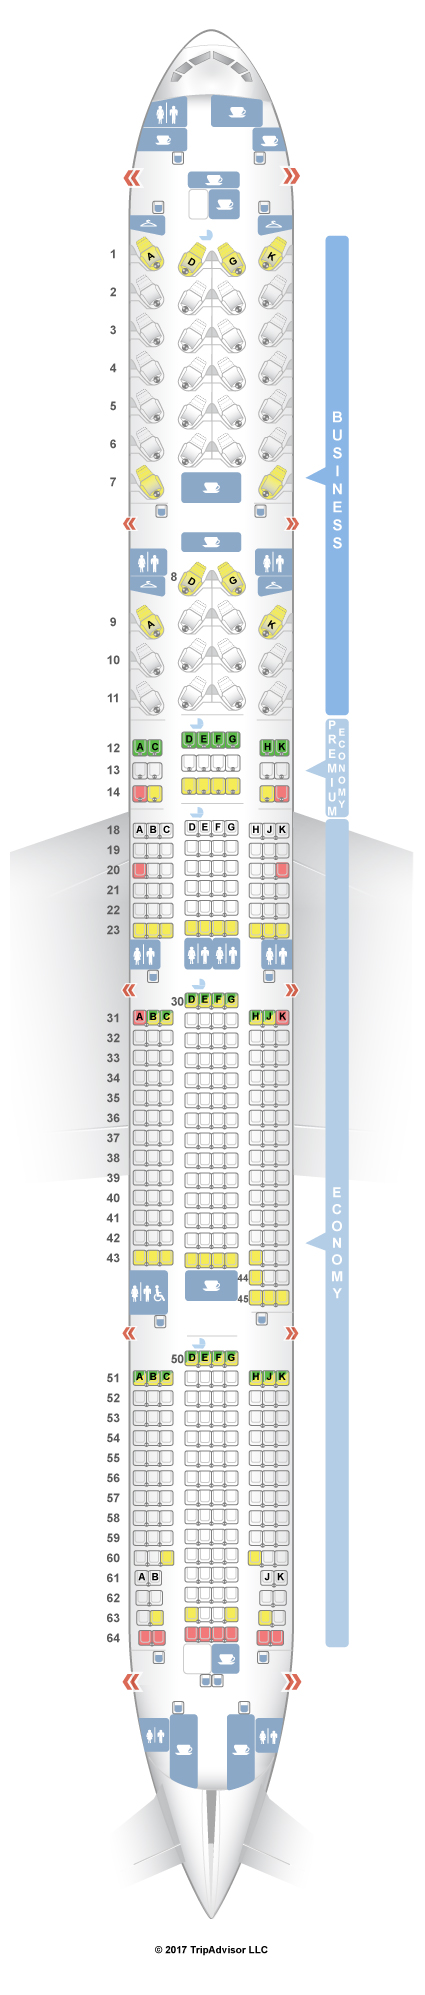 SeatGuru Seat Map Air Canada Boeing 777-300ER (77W) Three Class V1